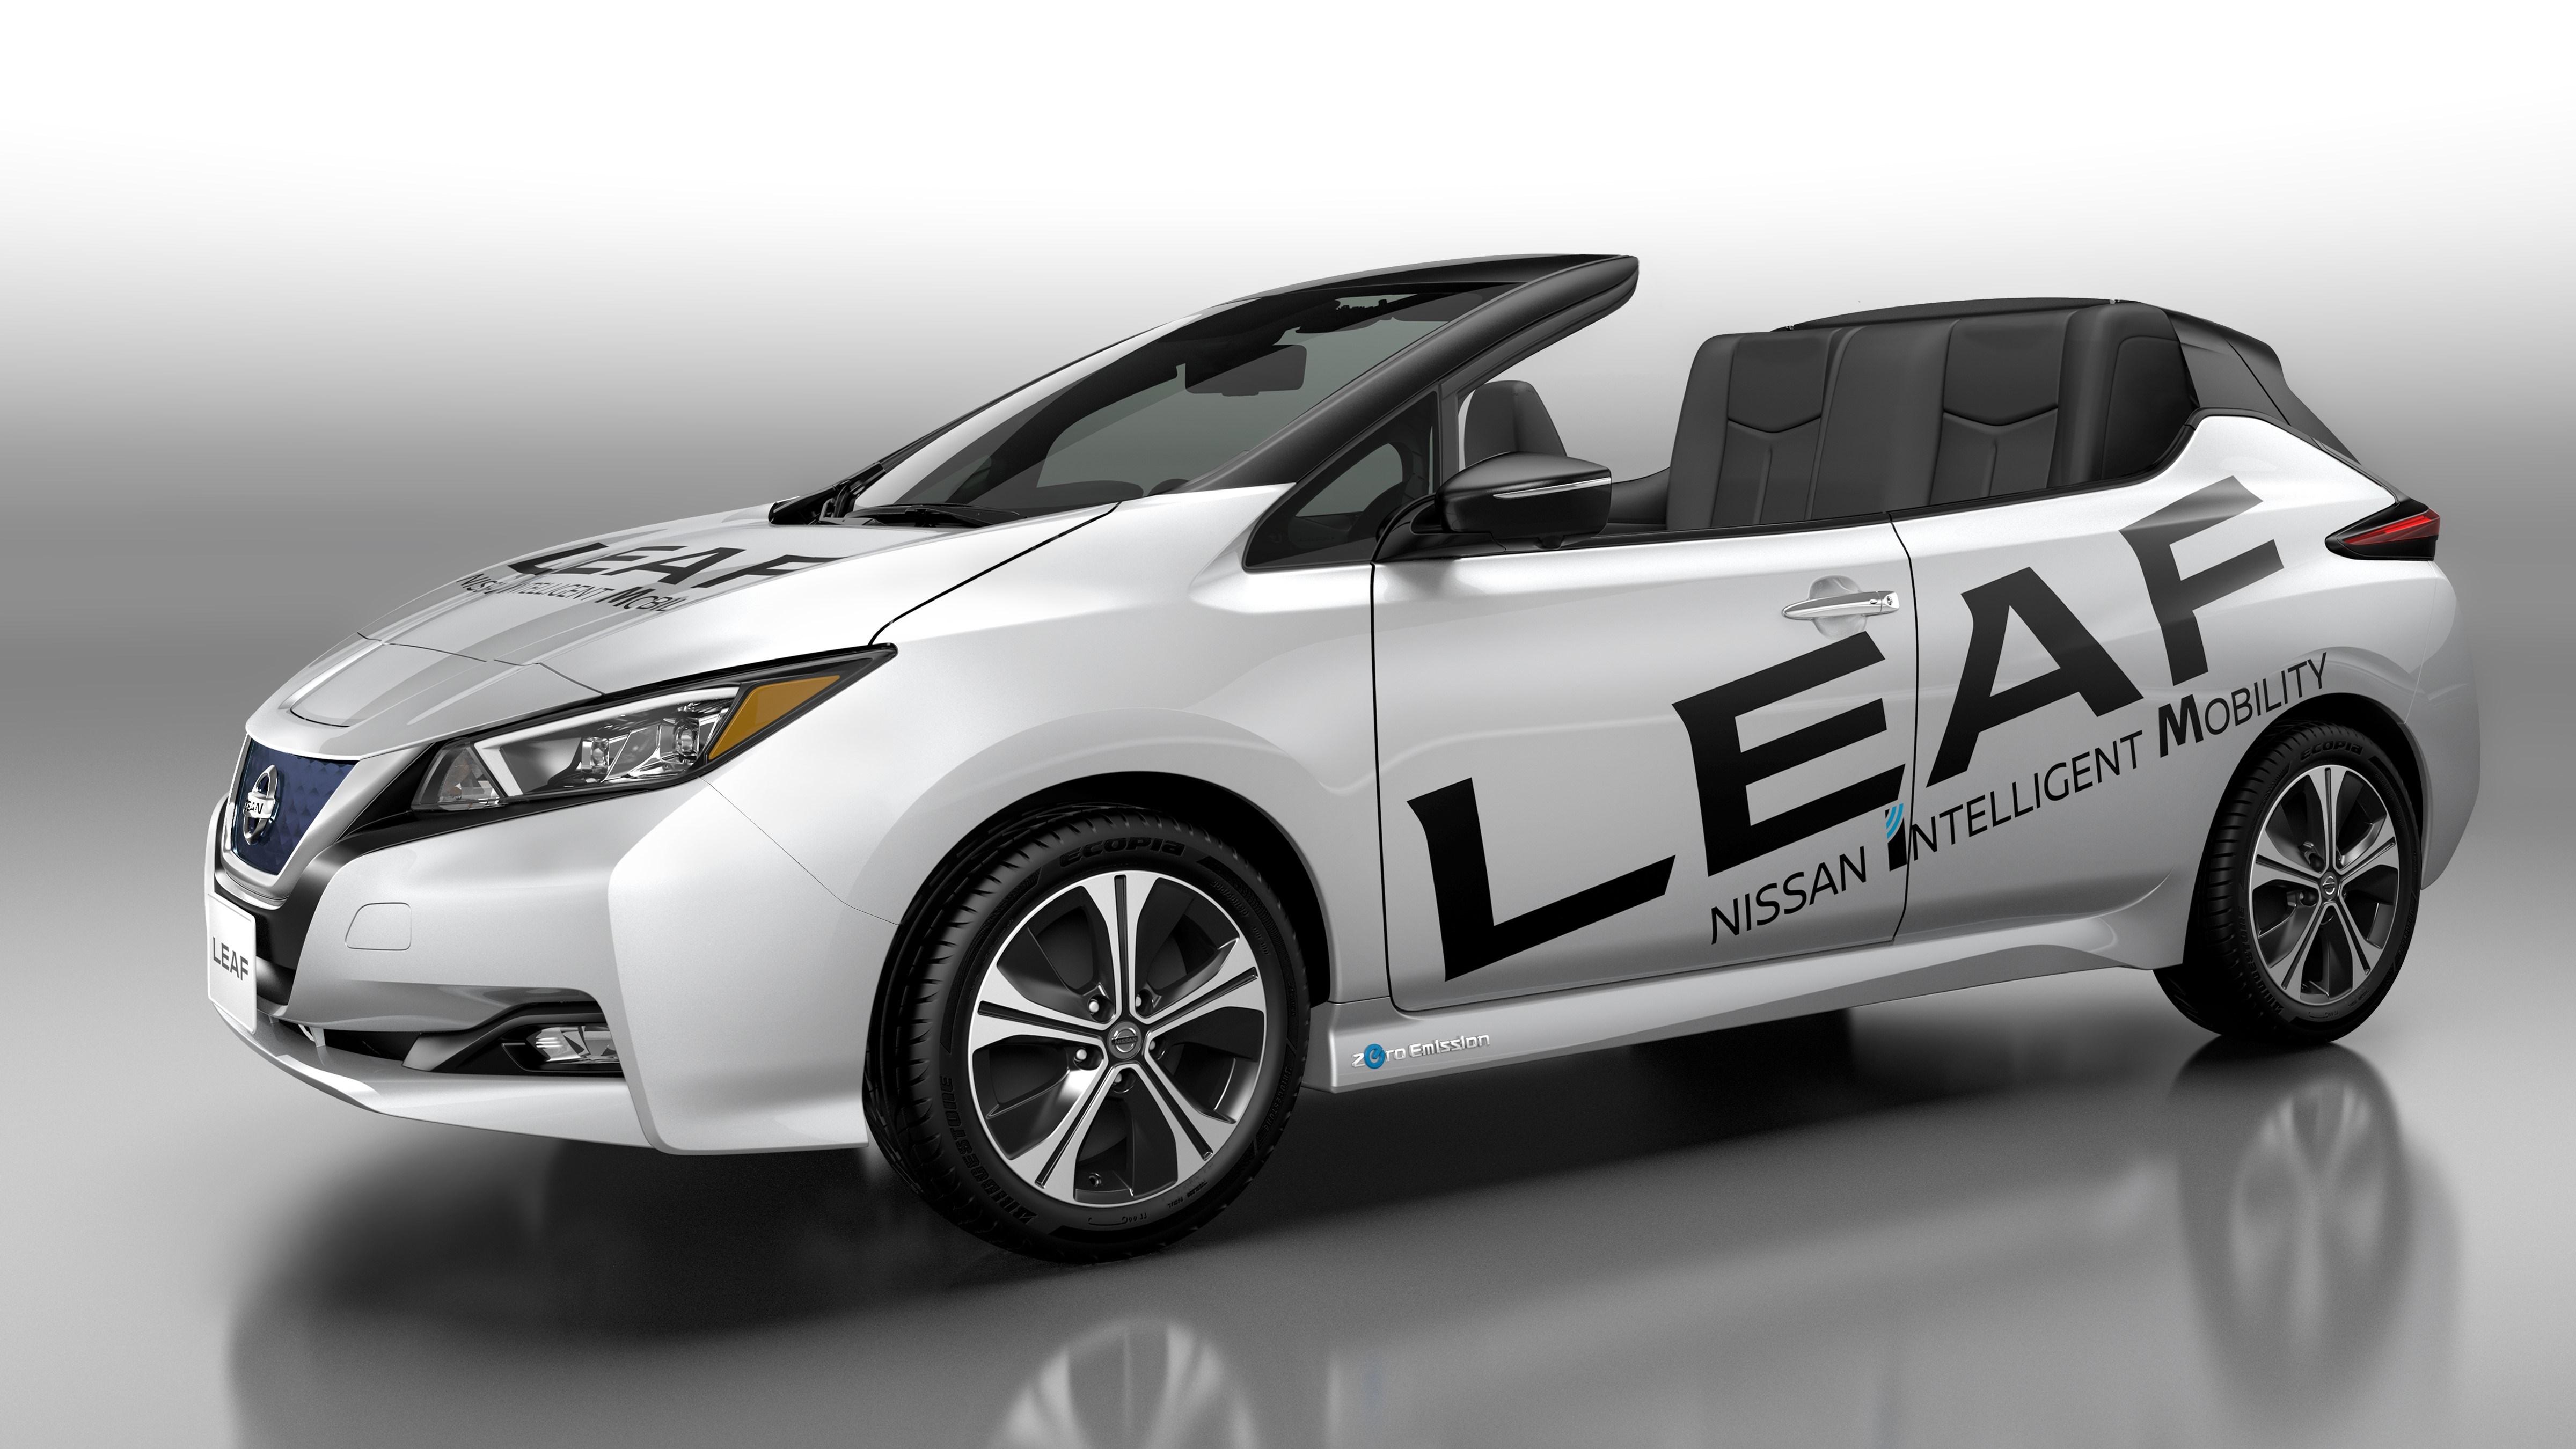 Nissan revela protótipo LEAF Open Car